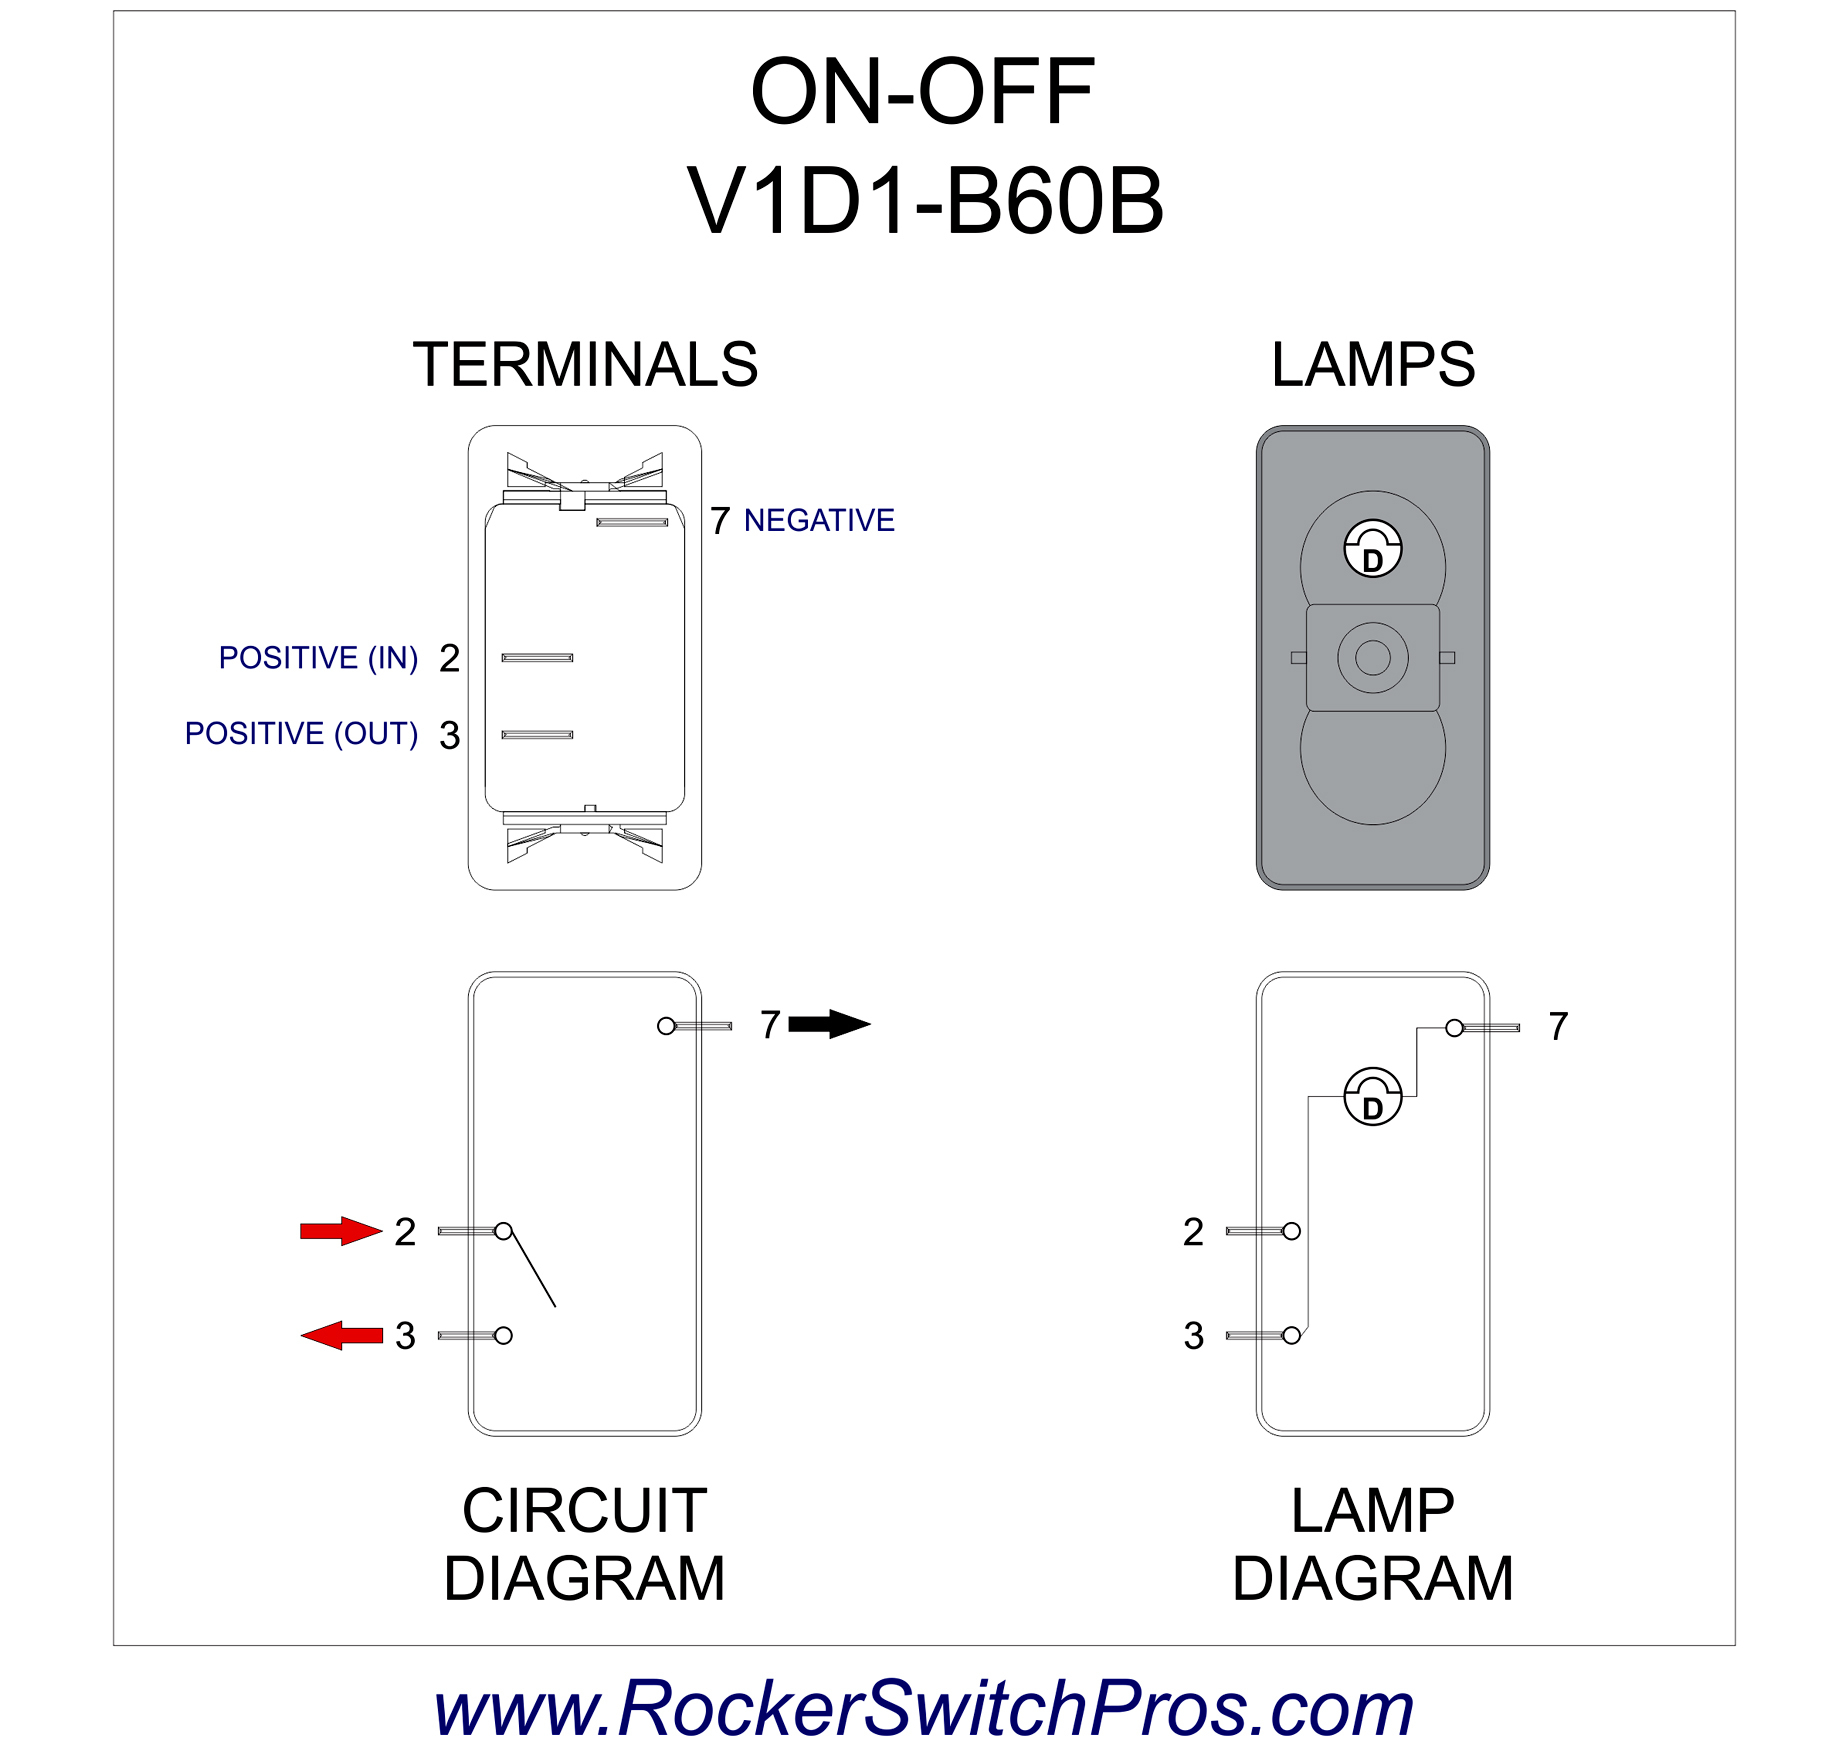 Carling Switch Wiring Diagram - Wiring Diagram Explained - Carlingswitch Wiring Diagram